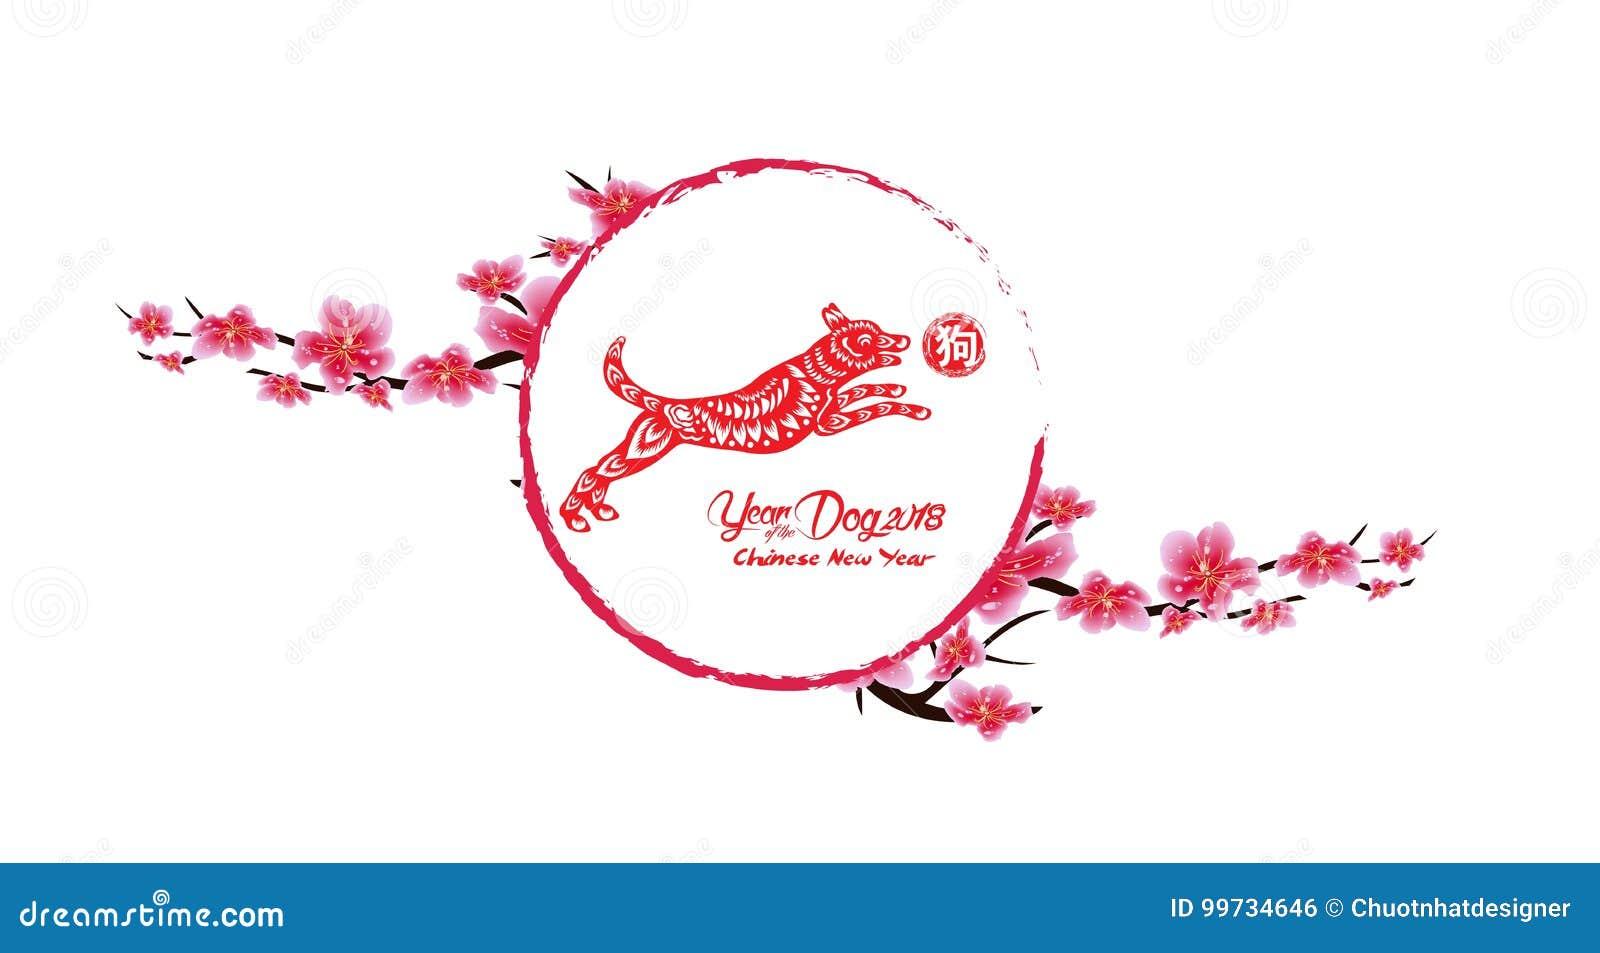 sakura flowers background cherry blossom isolated white background chinese new year 2018 hieroglyph